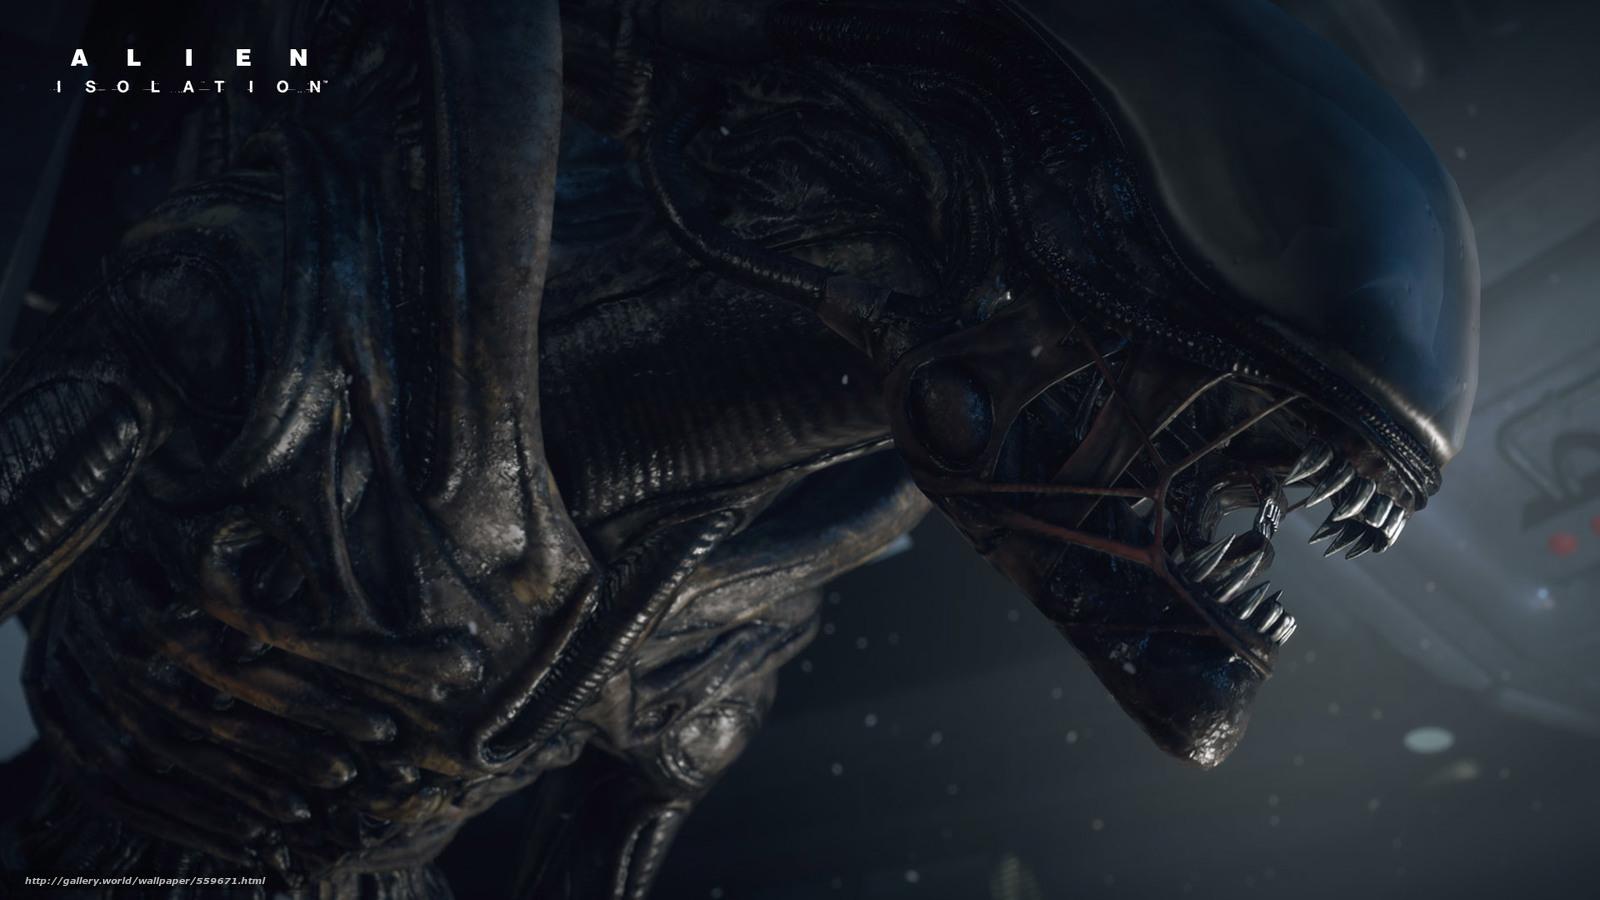 Download wallpaper Alien: Isolation,  games free desktop wallpaper in the resolution 1920x1080 — picture №559671